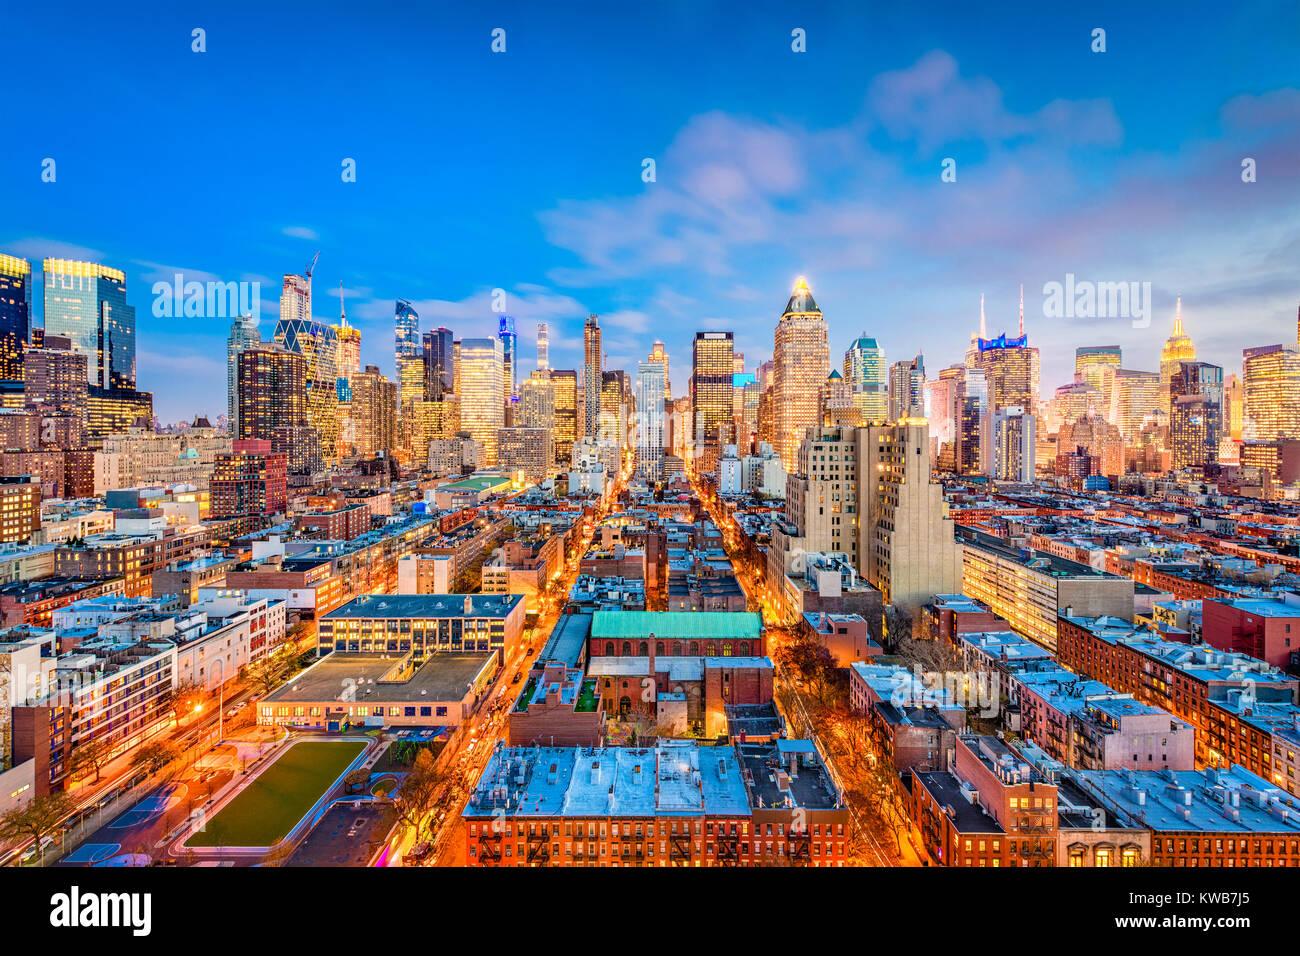 New York, New York, Stati Uniti d'America Midtown Manhattan cityscape. Immagini Stock